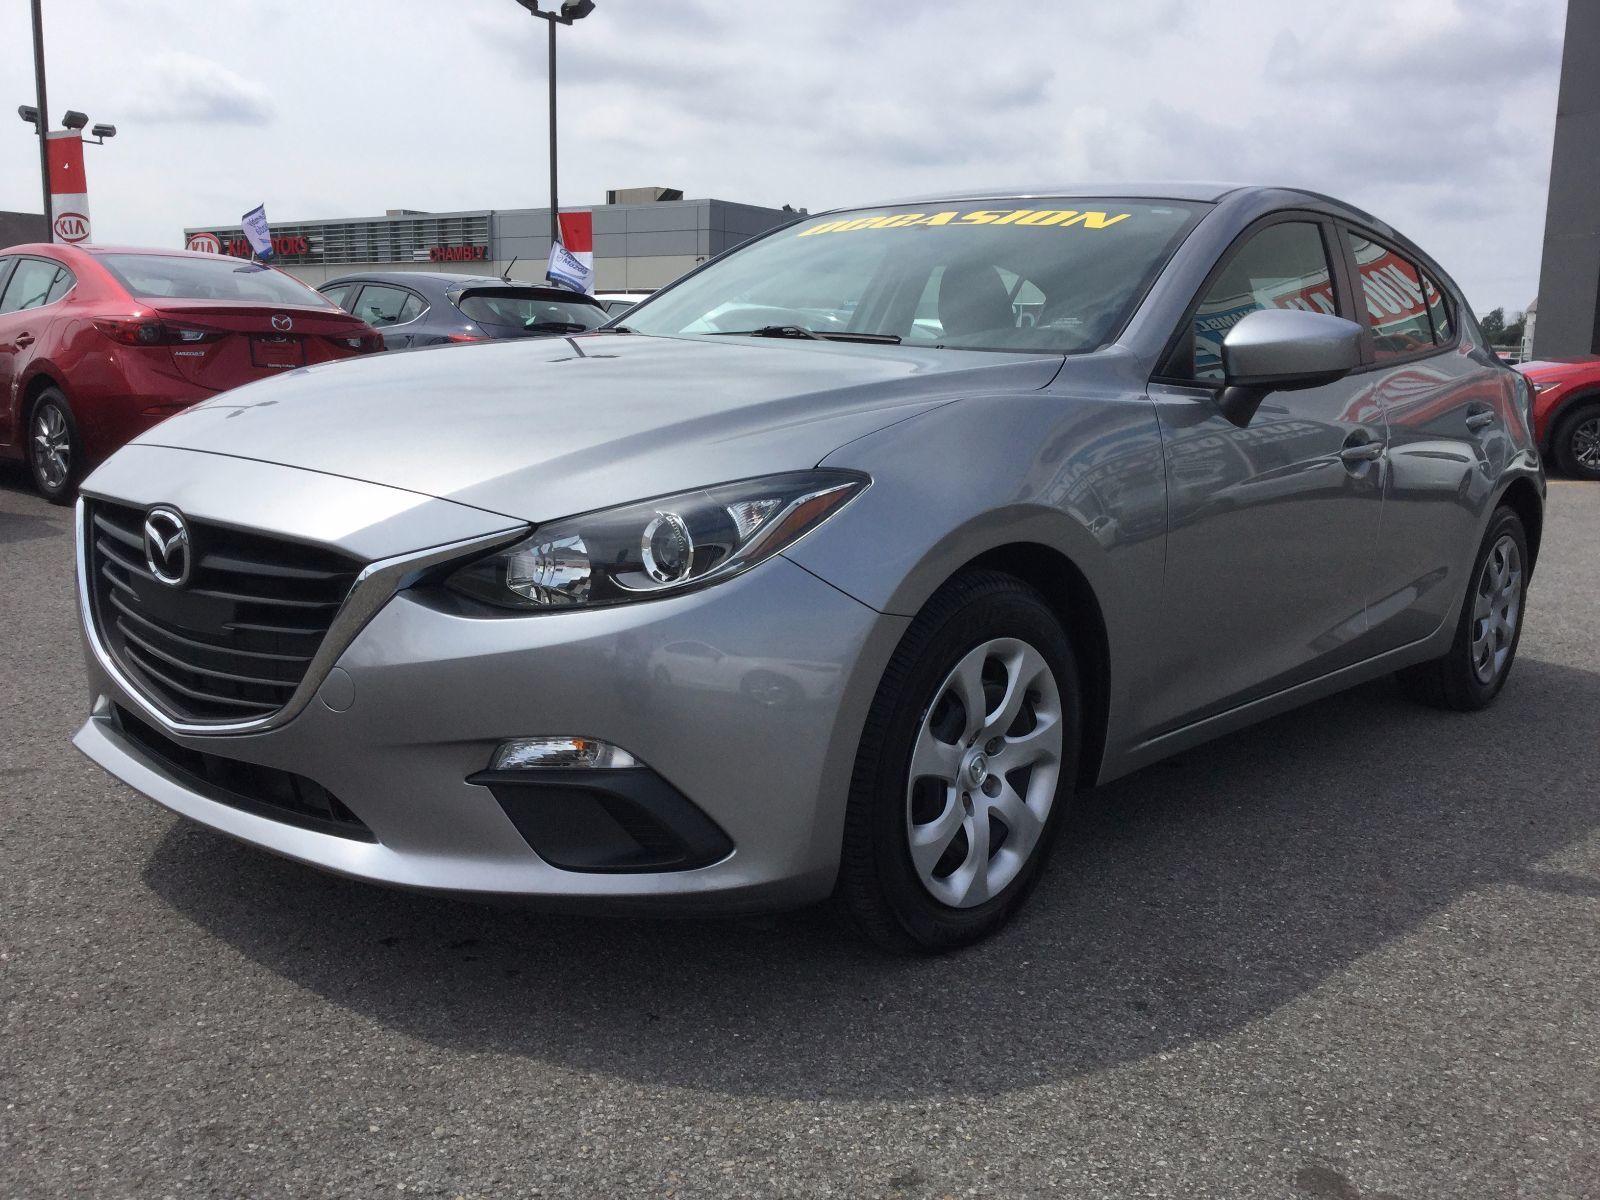 Mazda Mazda3 GX-SKY, SEULEMENT 33000 KM, BLUETOOTH 2014 JAMAIS ACCIDENTÉ, UN SEUL PROPRIÉTAIRE